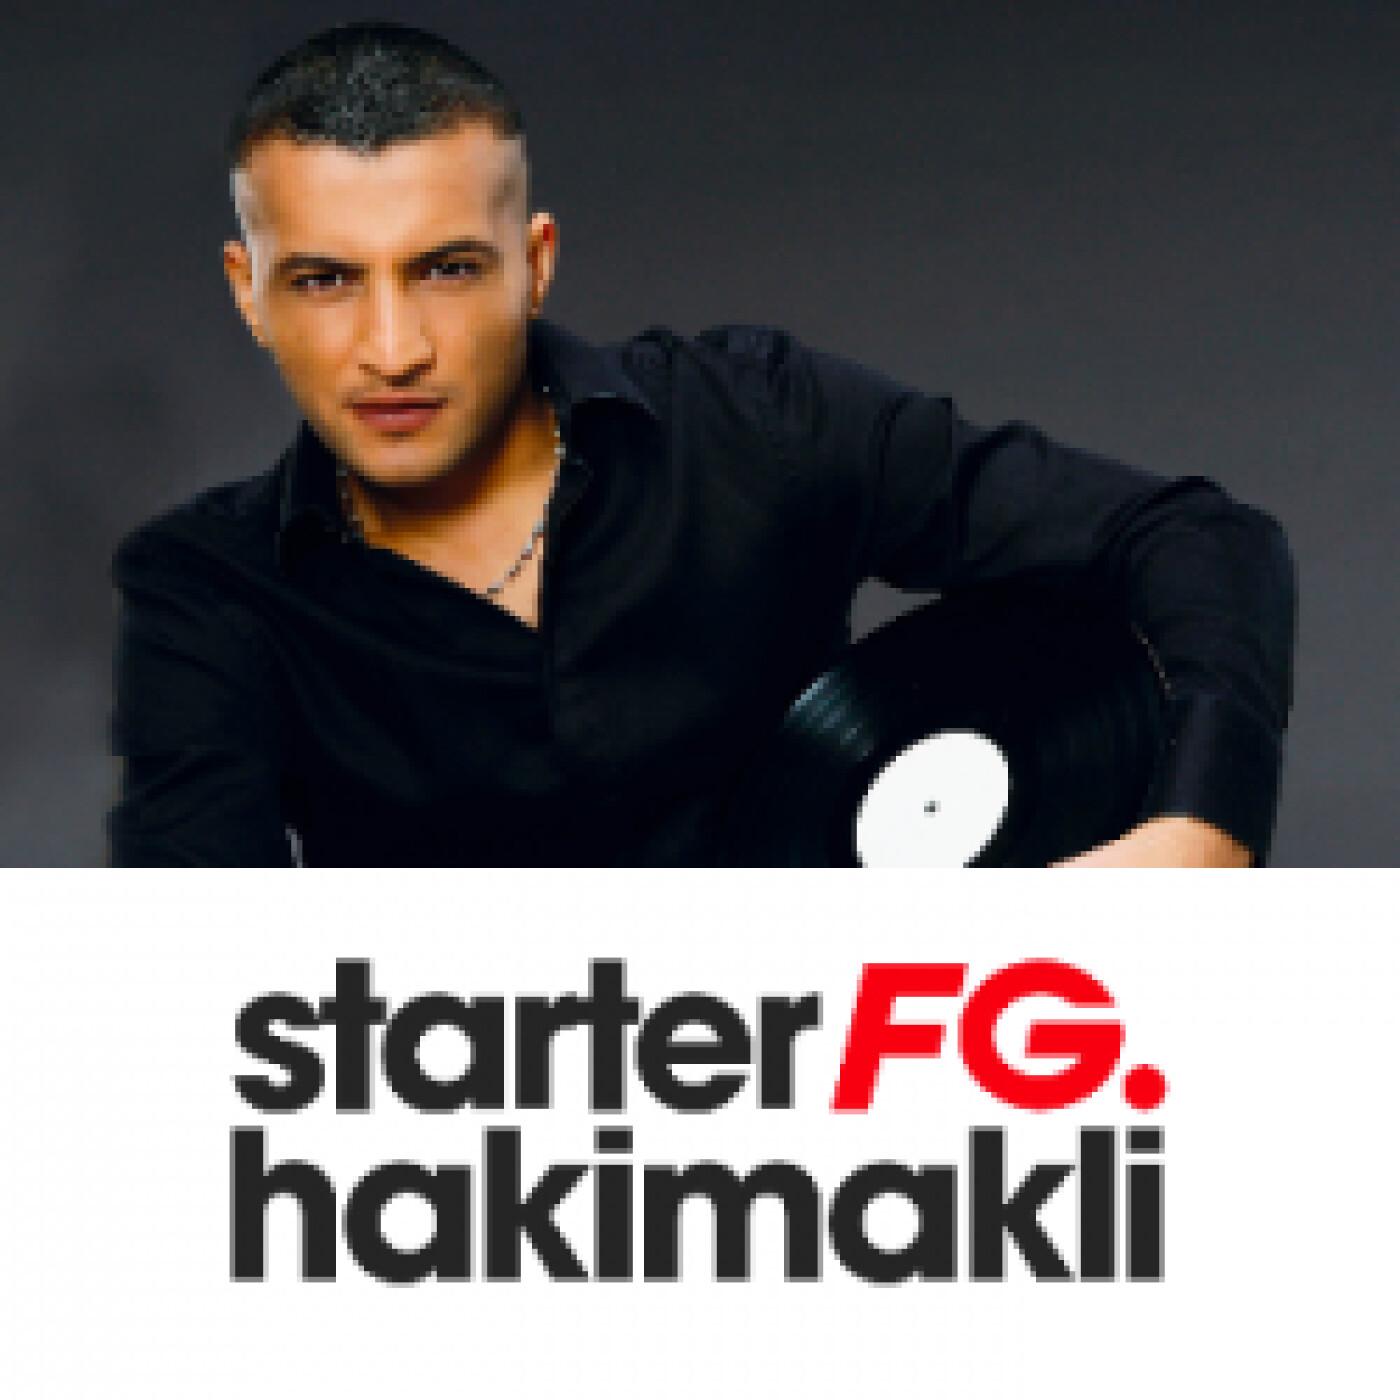 STARTER FG BY HAKIMAKLI MARDI 04 MAI 2021